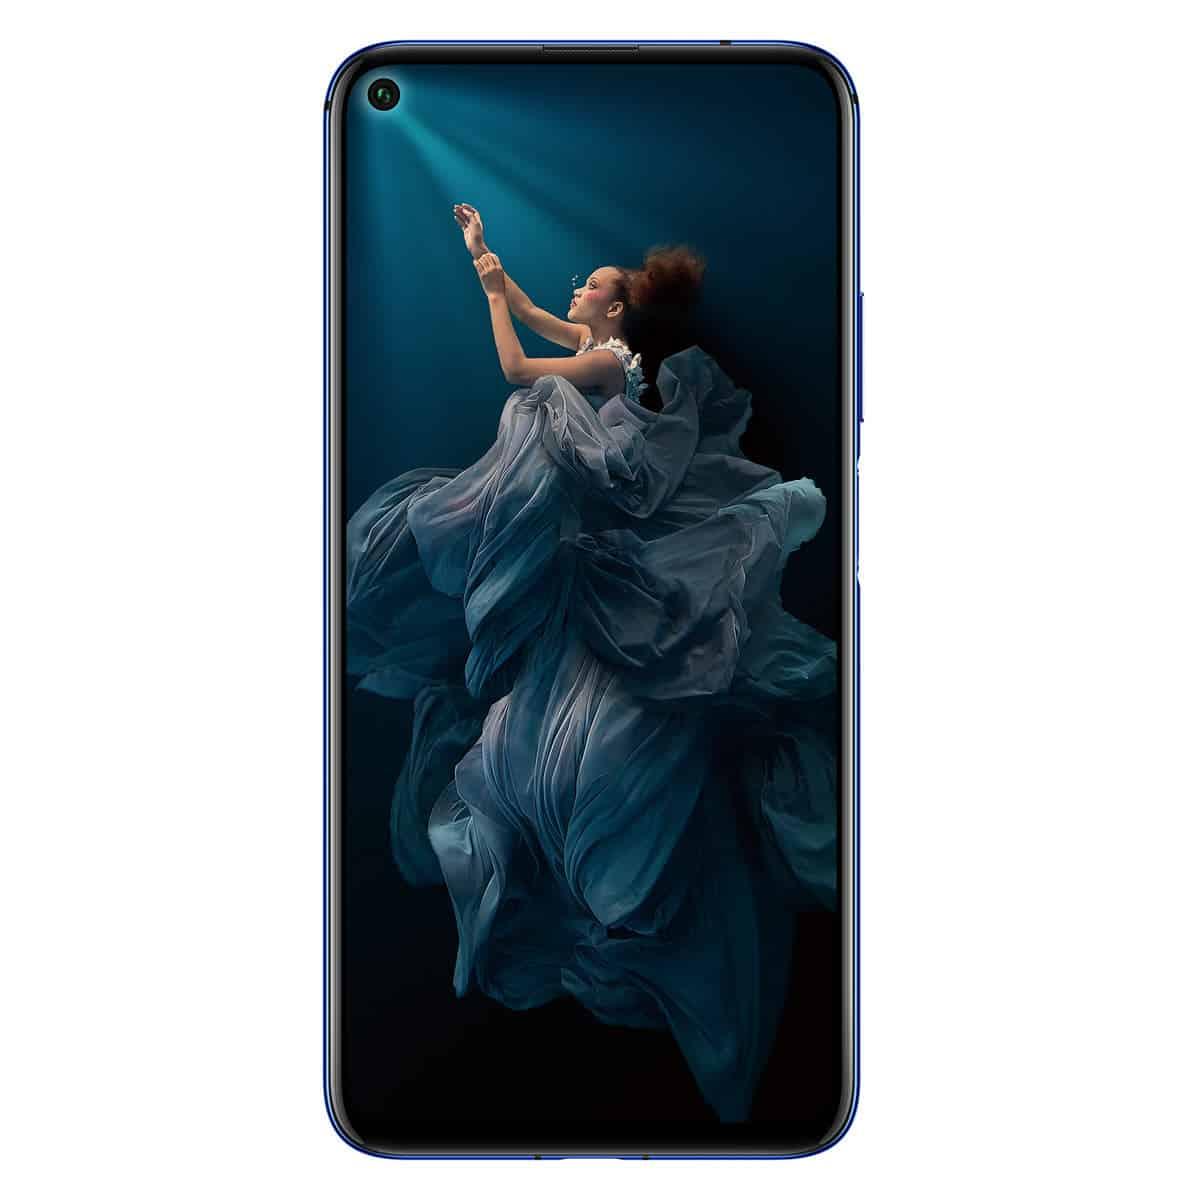 Honor-20-Sapphire-Blue_2